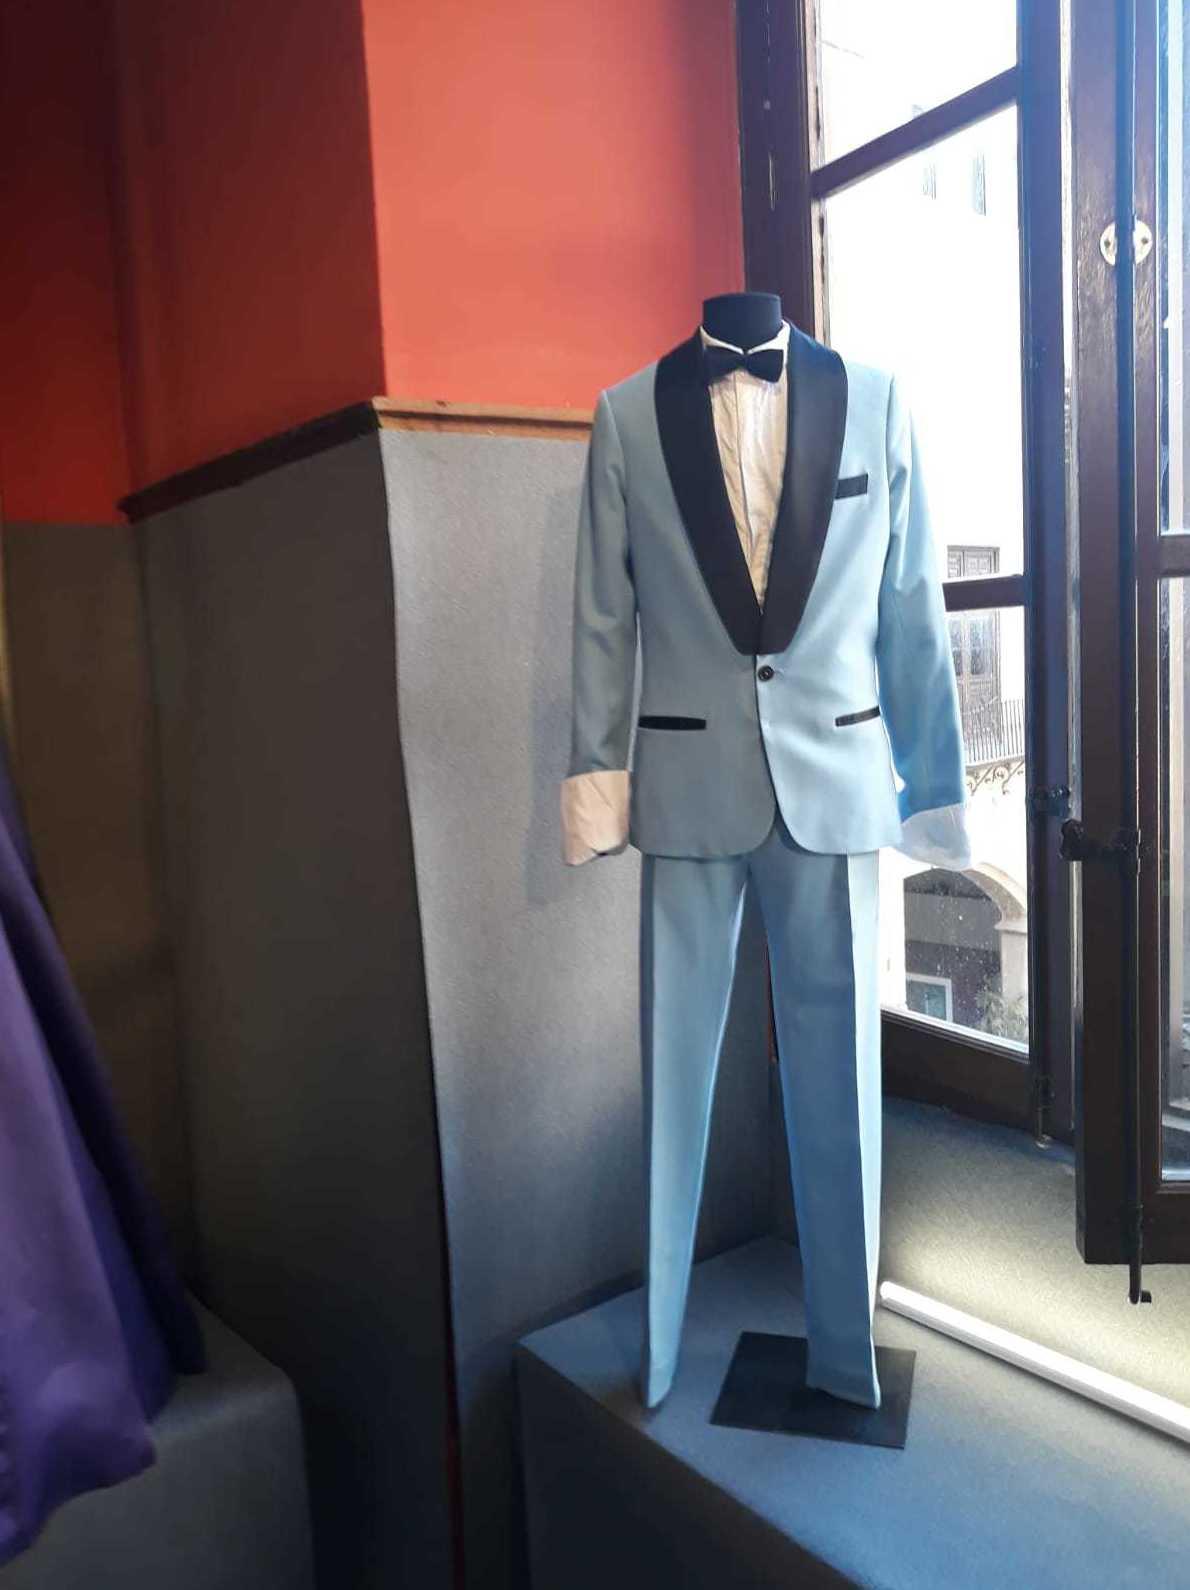 Alquiler de maniquíes para exposición de trajes de comunión